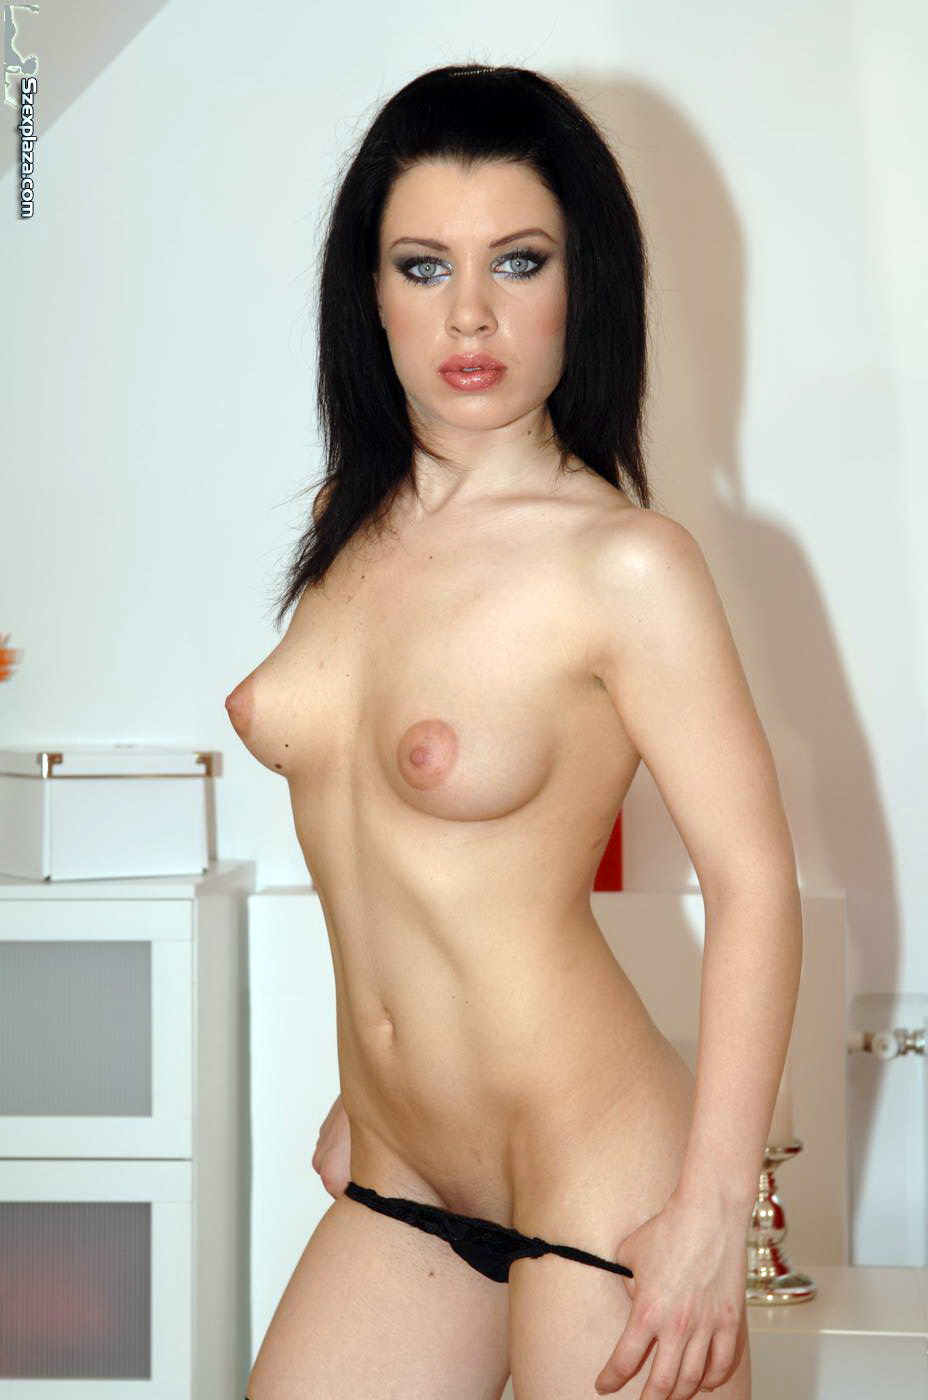 256715372_Bridget_Jolie_123_470lo.JPG